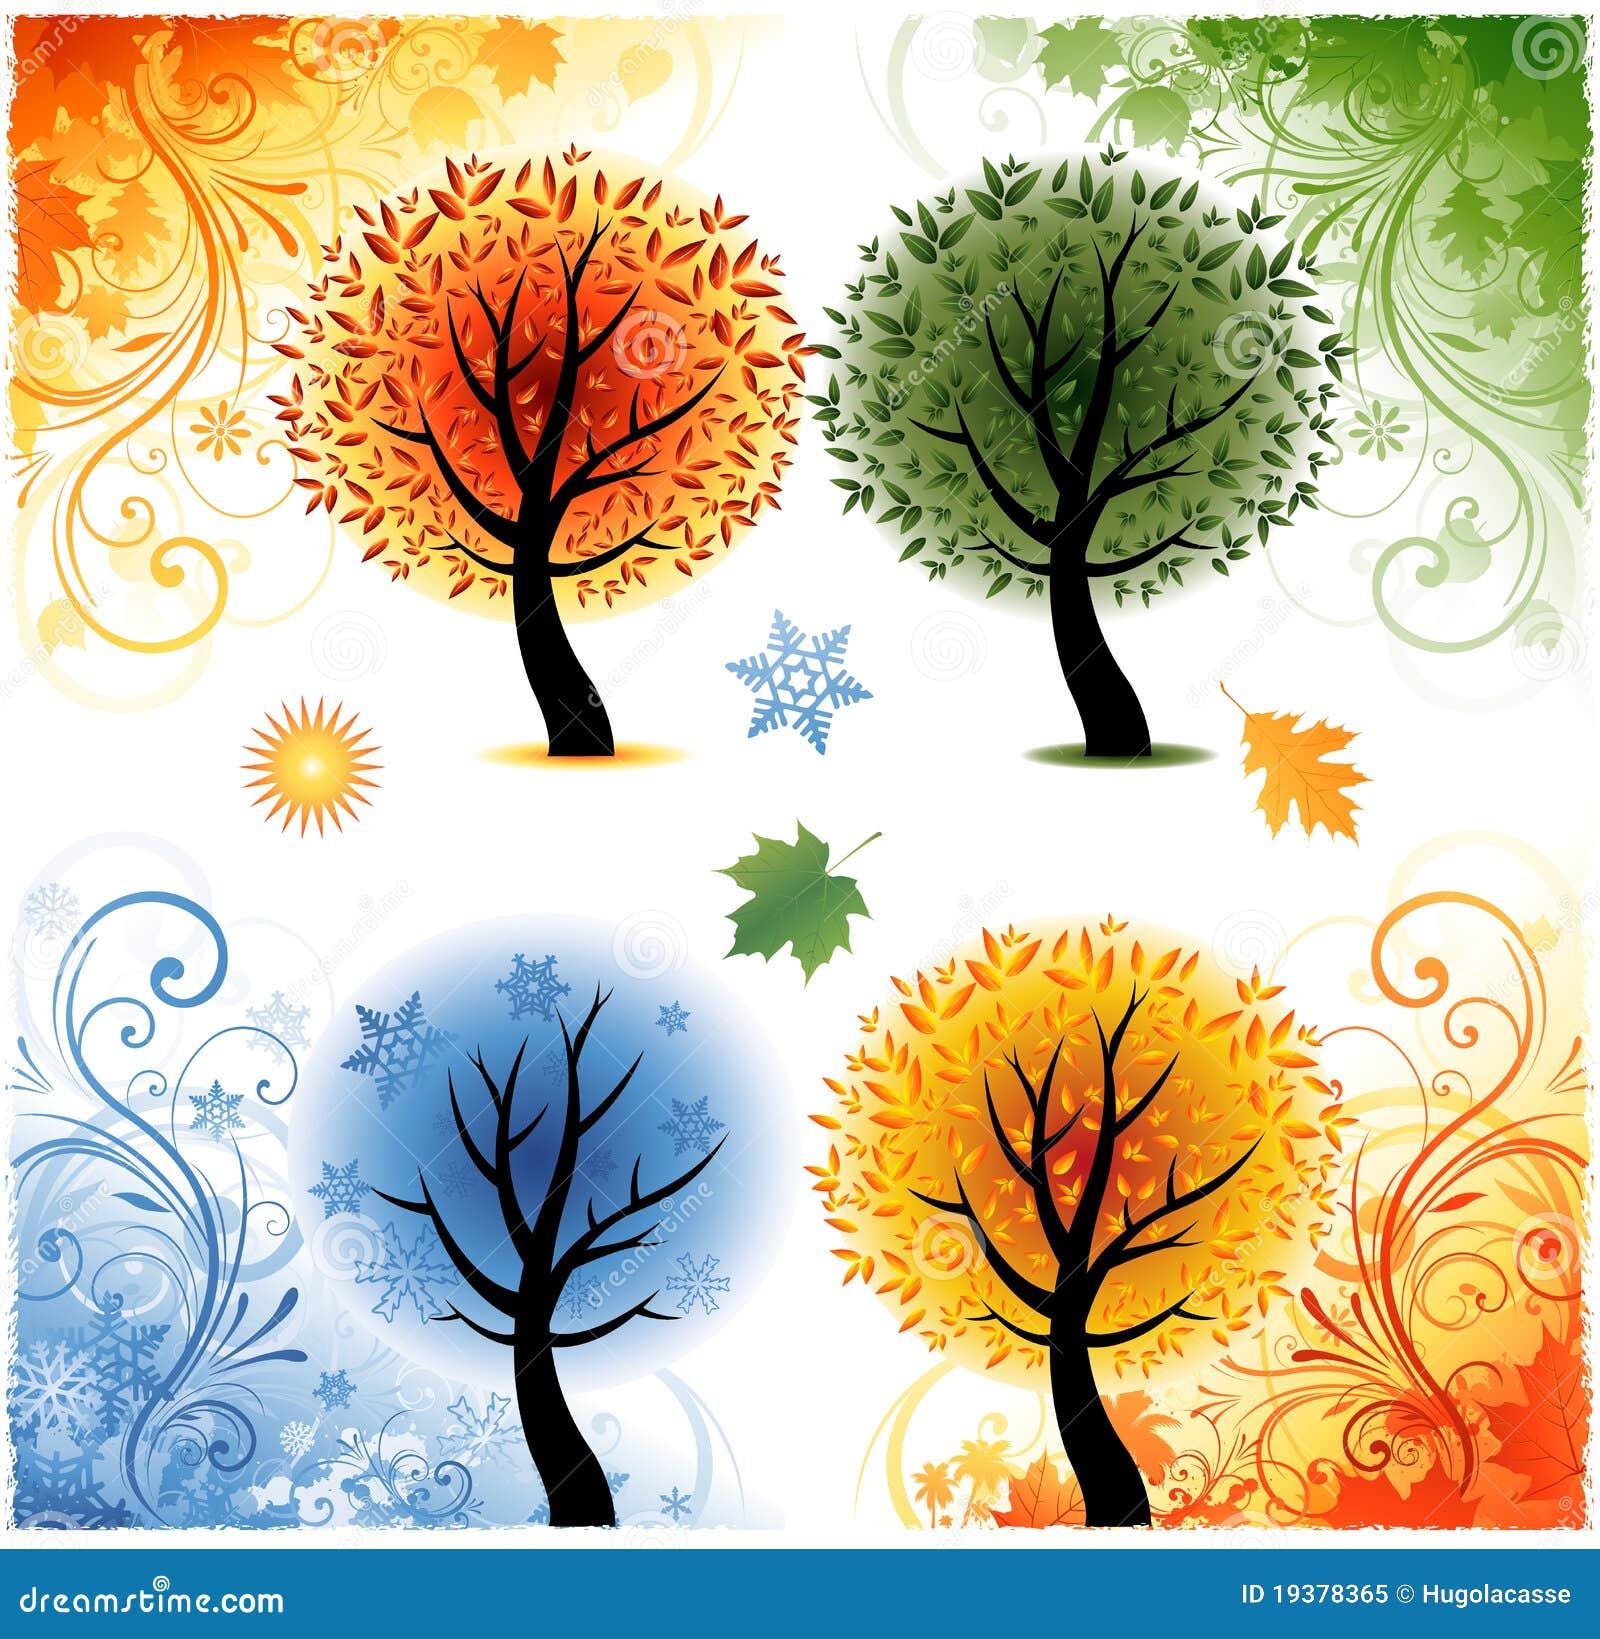 Four Seasons Background Royalty Free Stock Photo - Image: 19378365